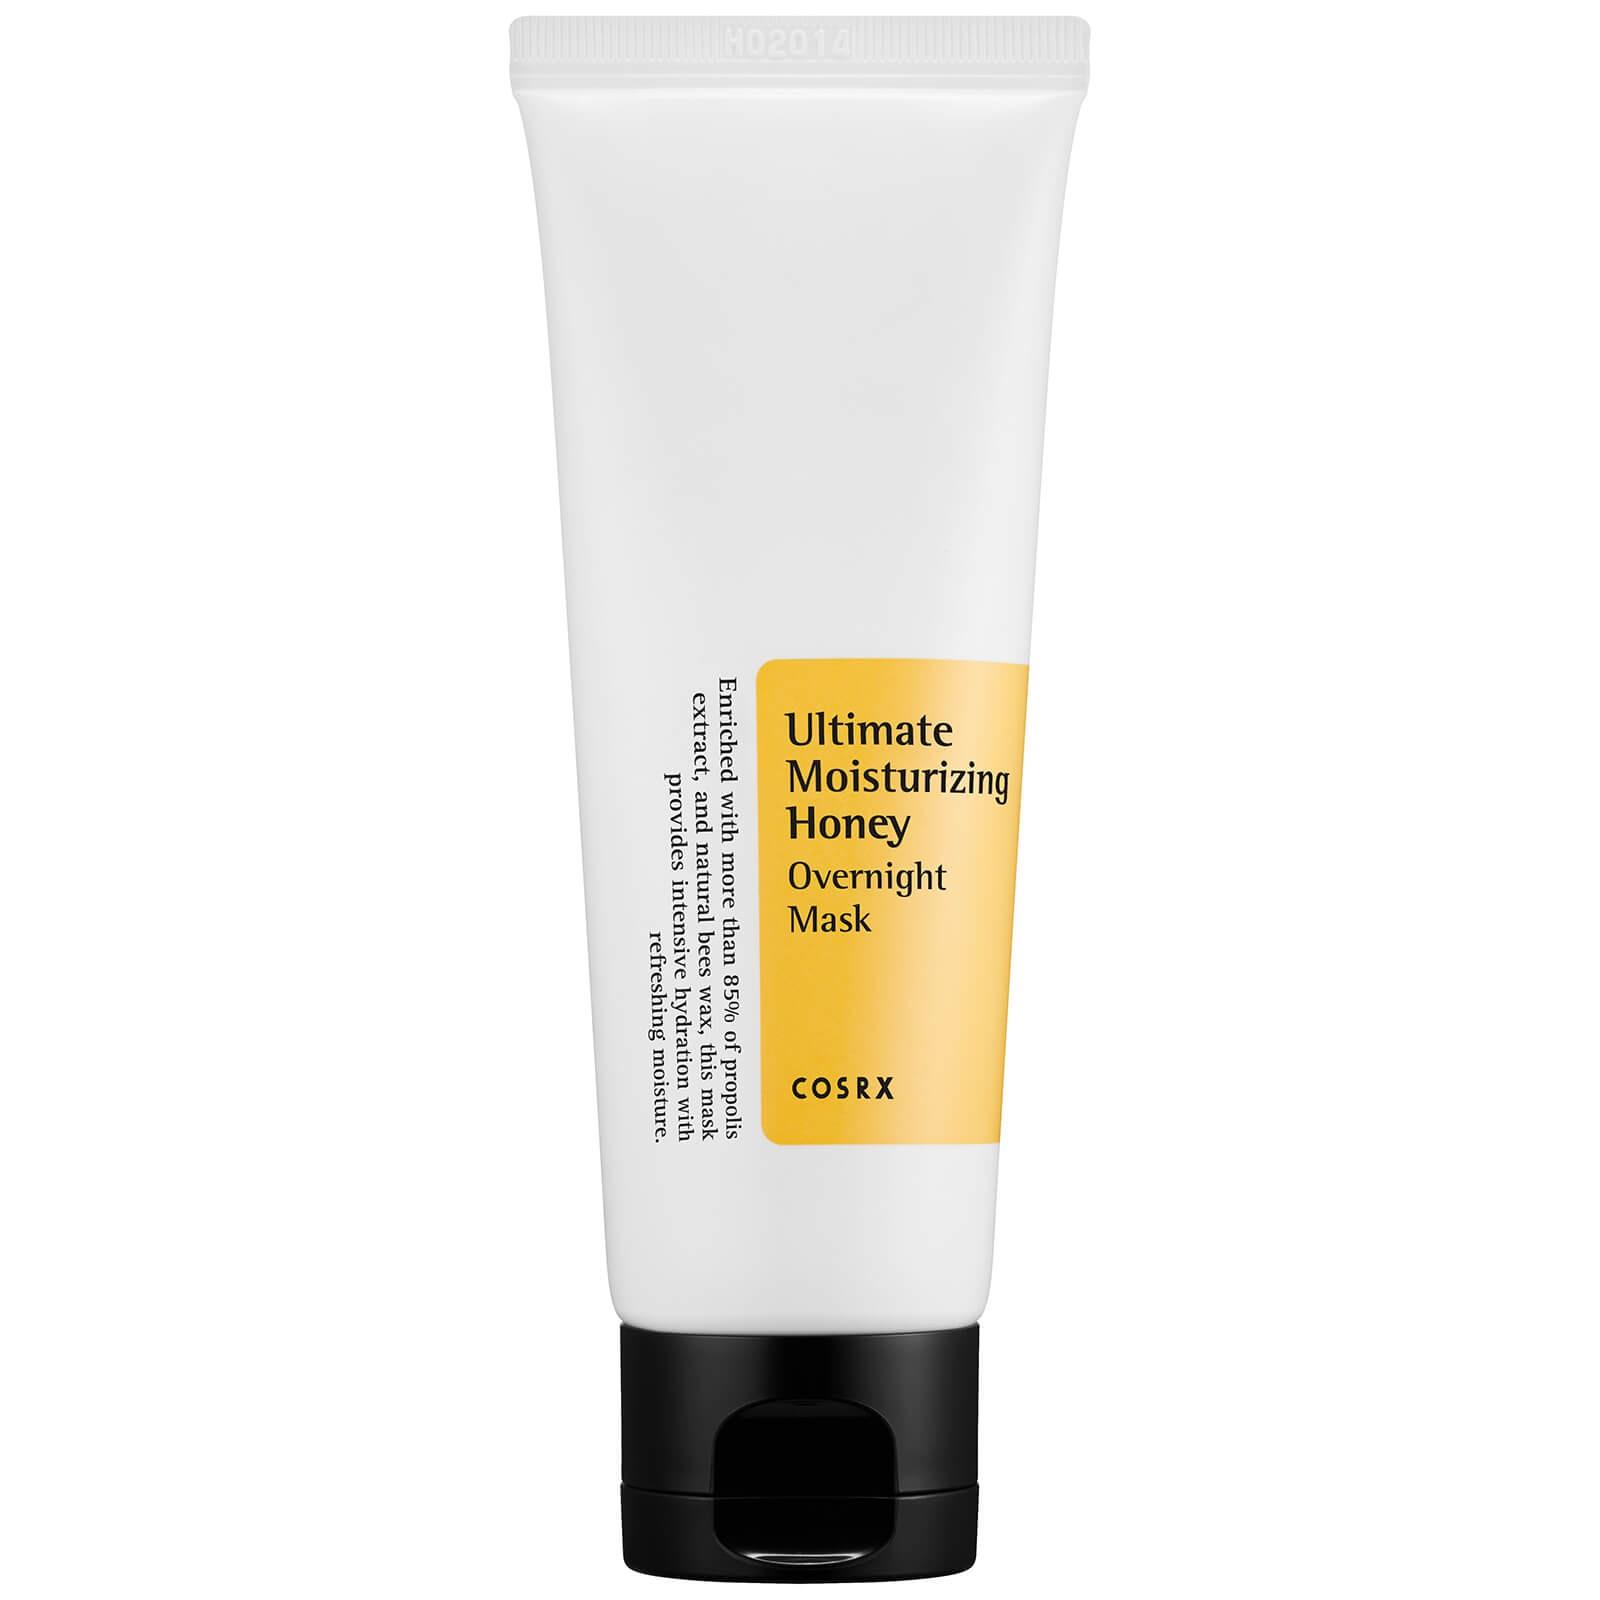 COSRX - Ultimate Moisturizing Honey Overnight Mask